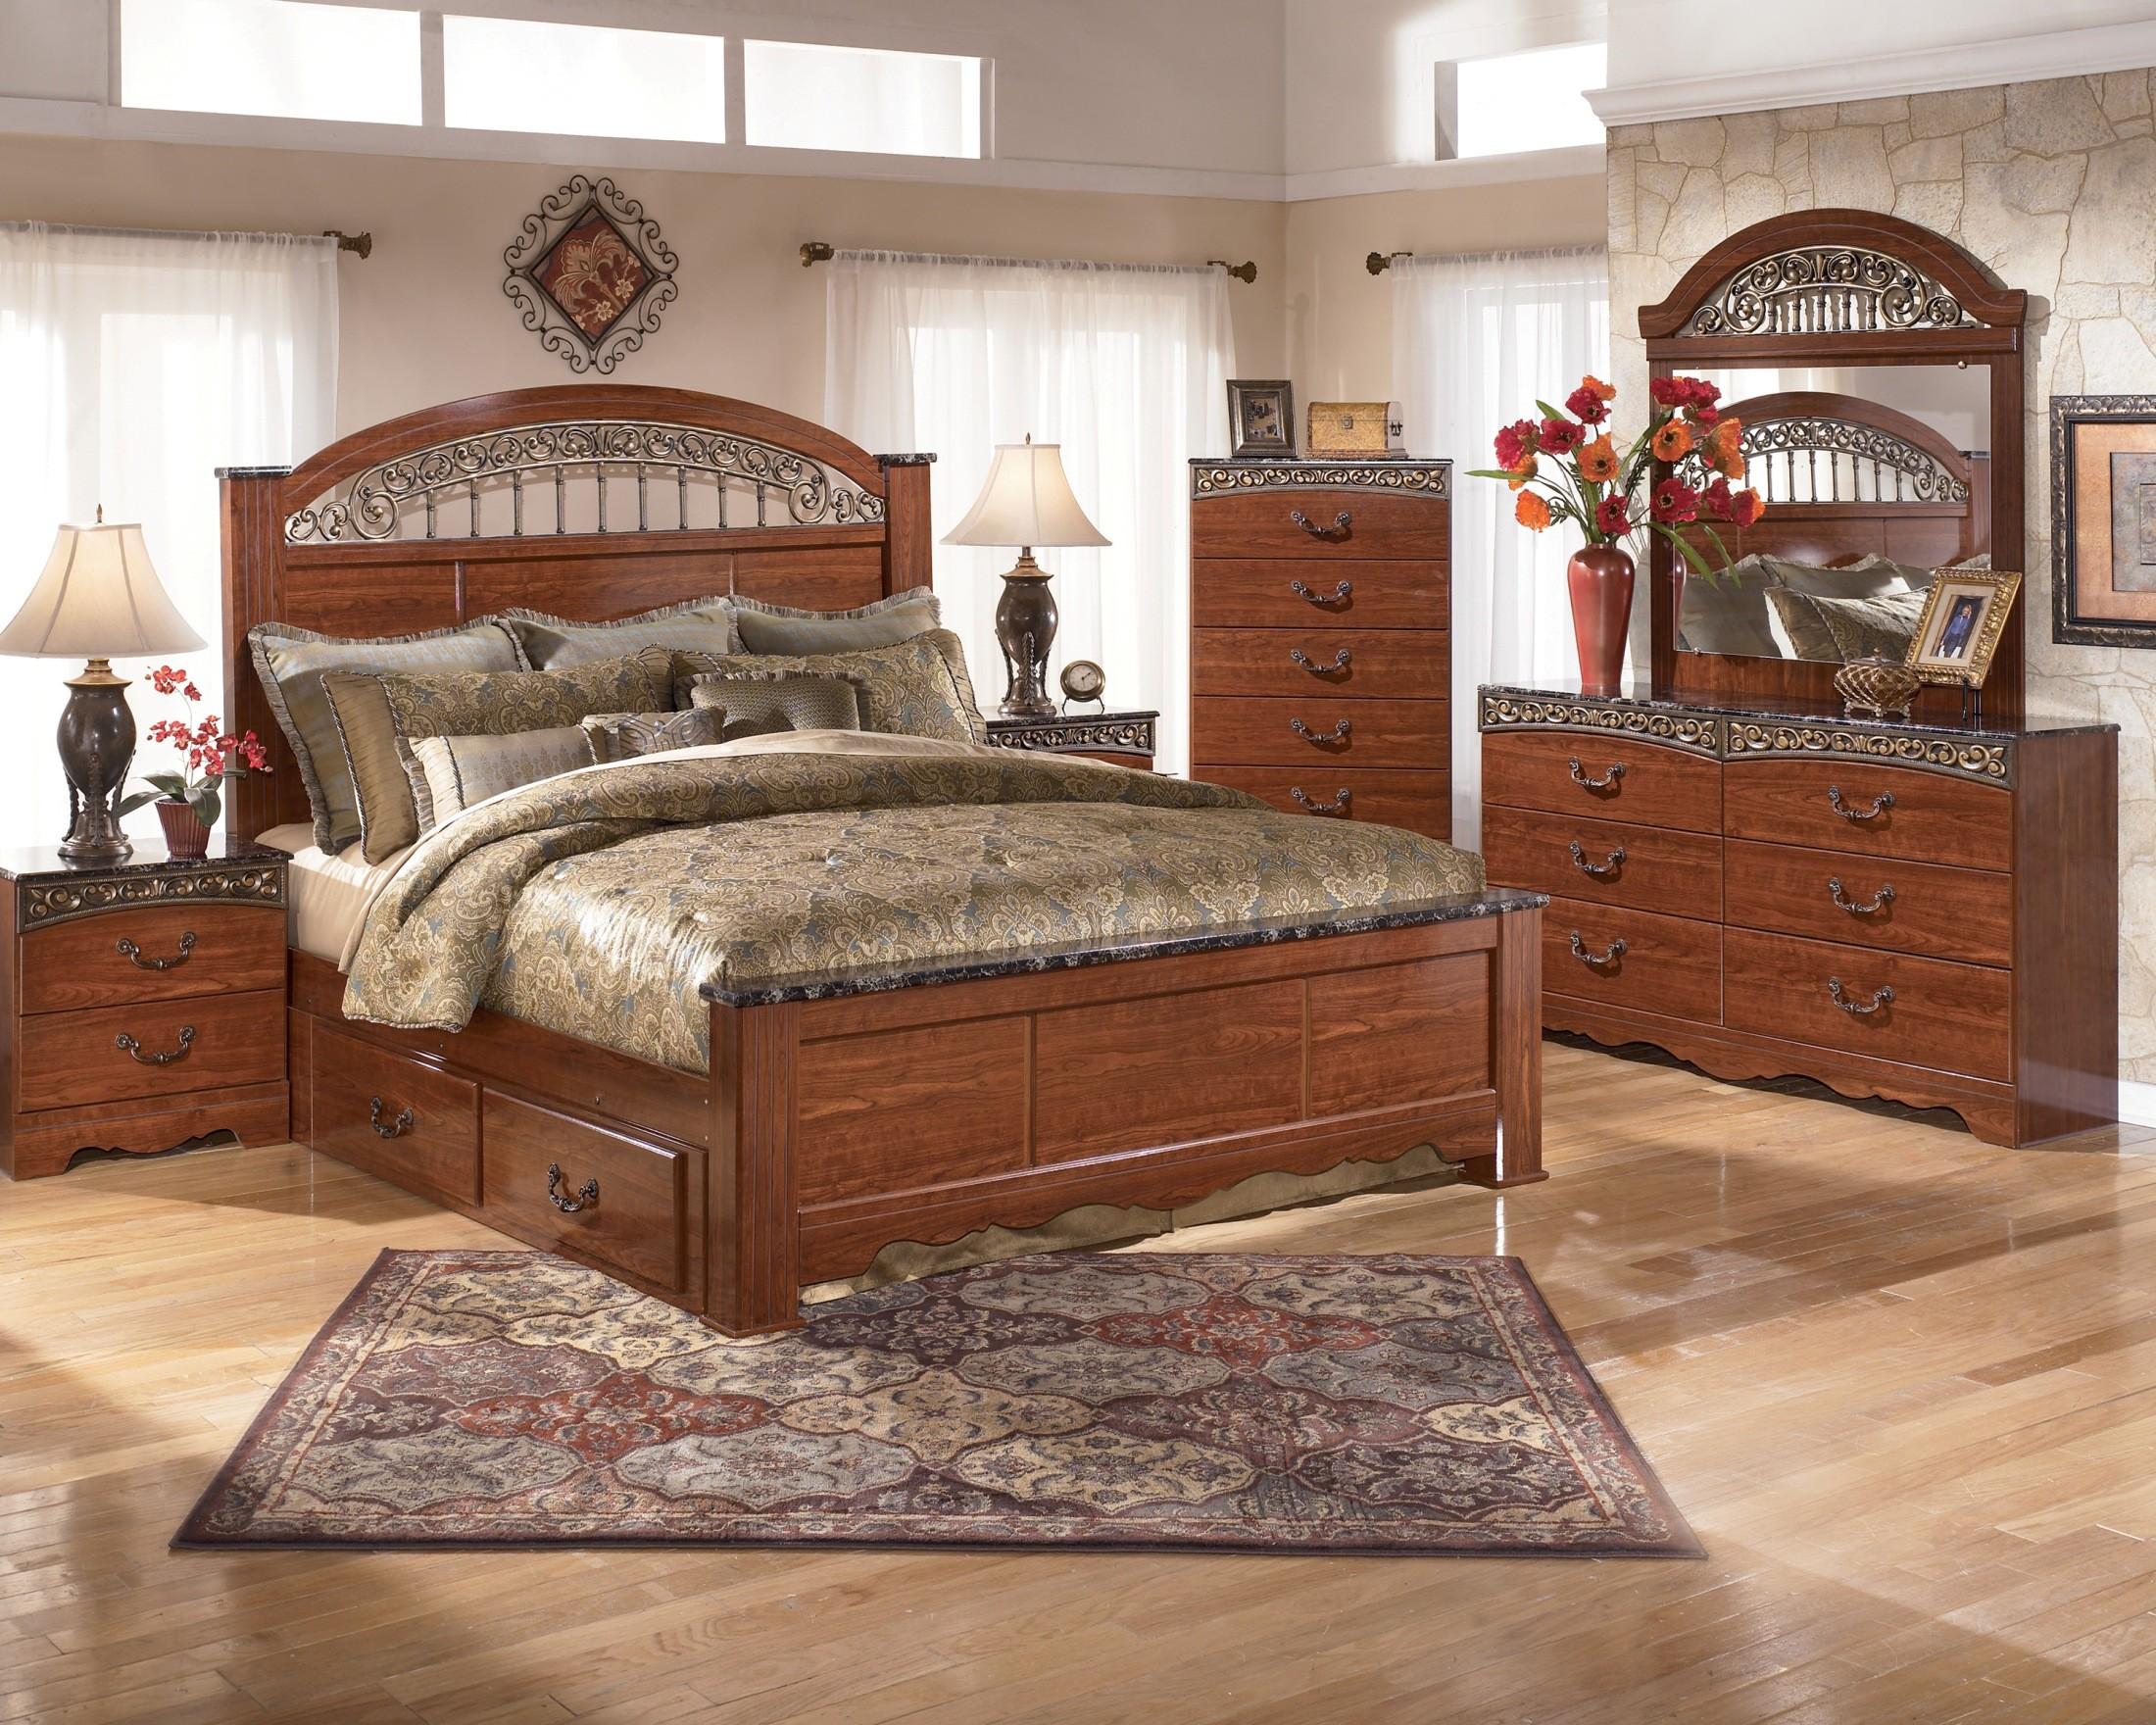 Fairbrooks Estate Poster Bedroom Set From Ashley B105 67 64 98 Coleman Furniture